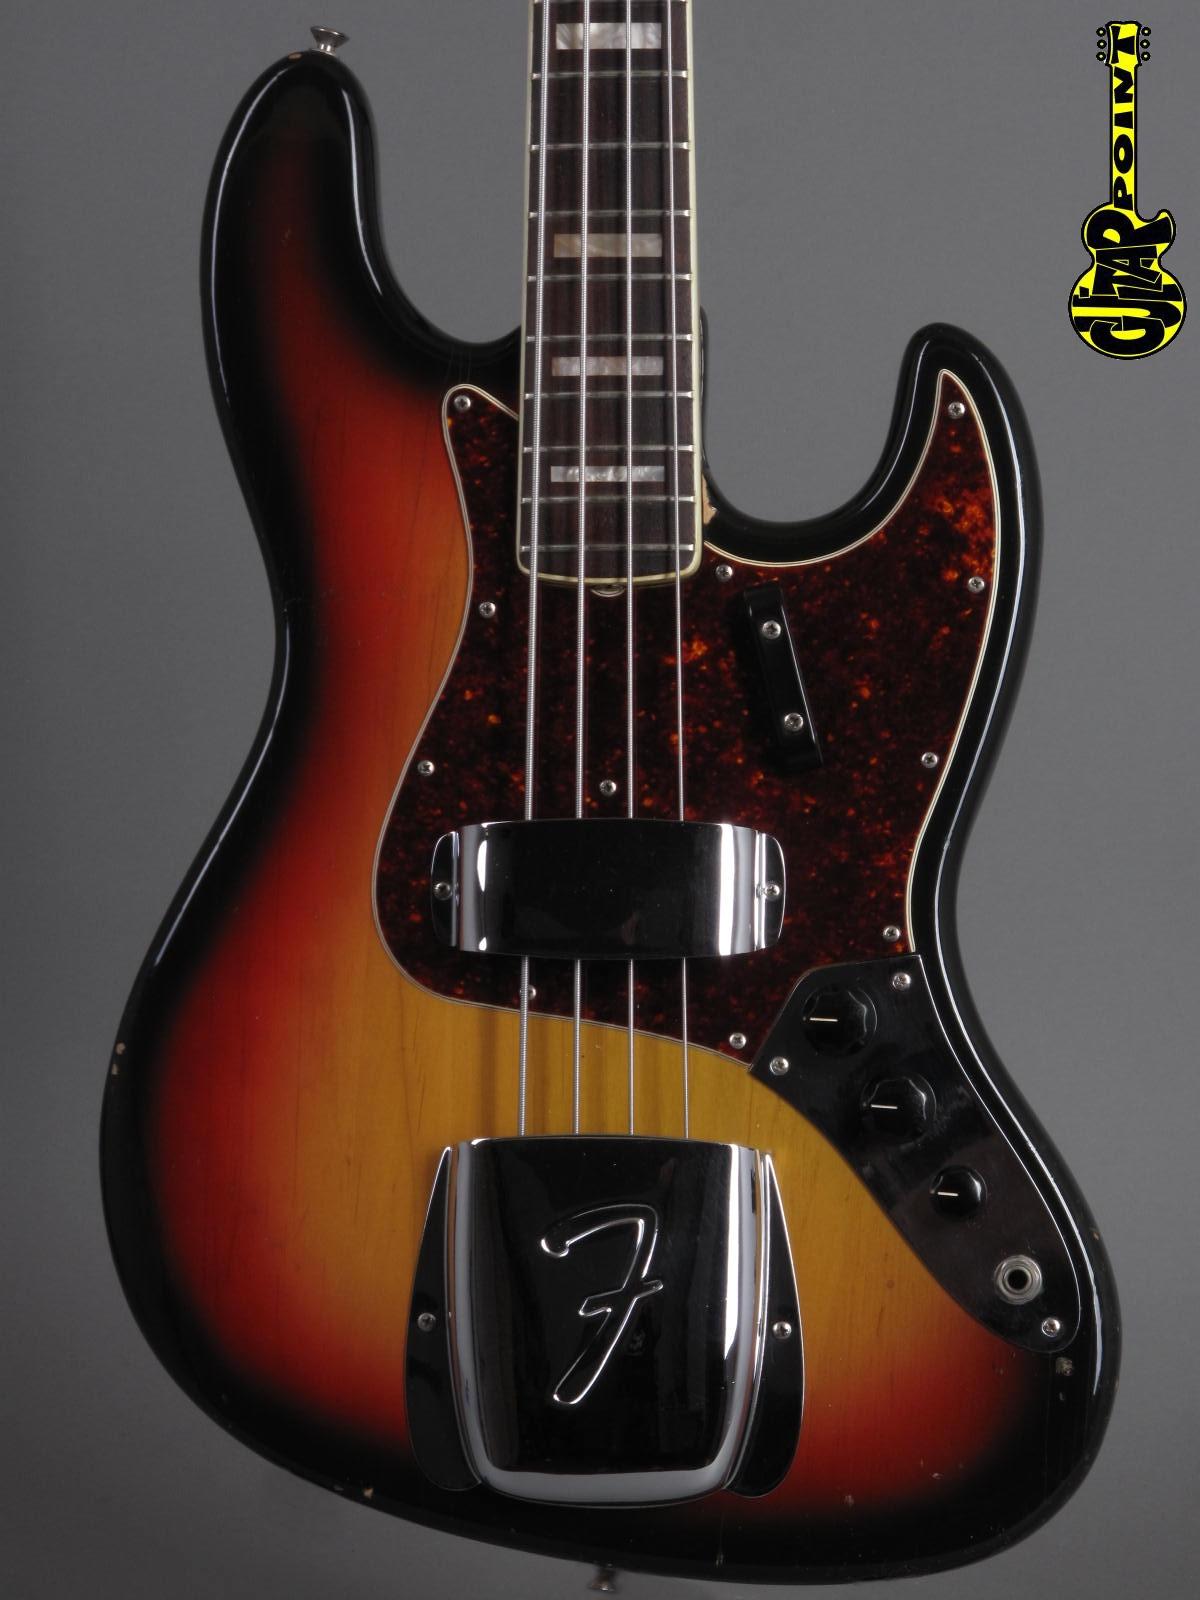 1971 Fender Jazz Bass - 3t-Sunburst